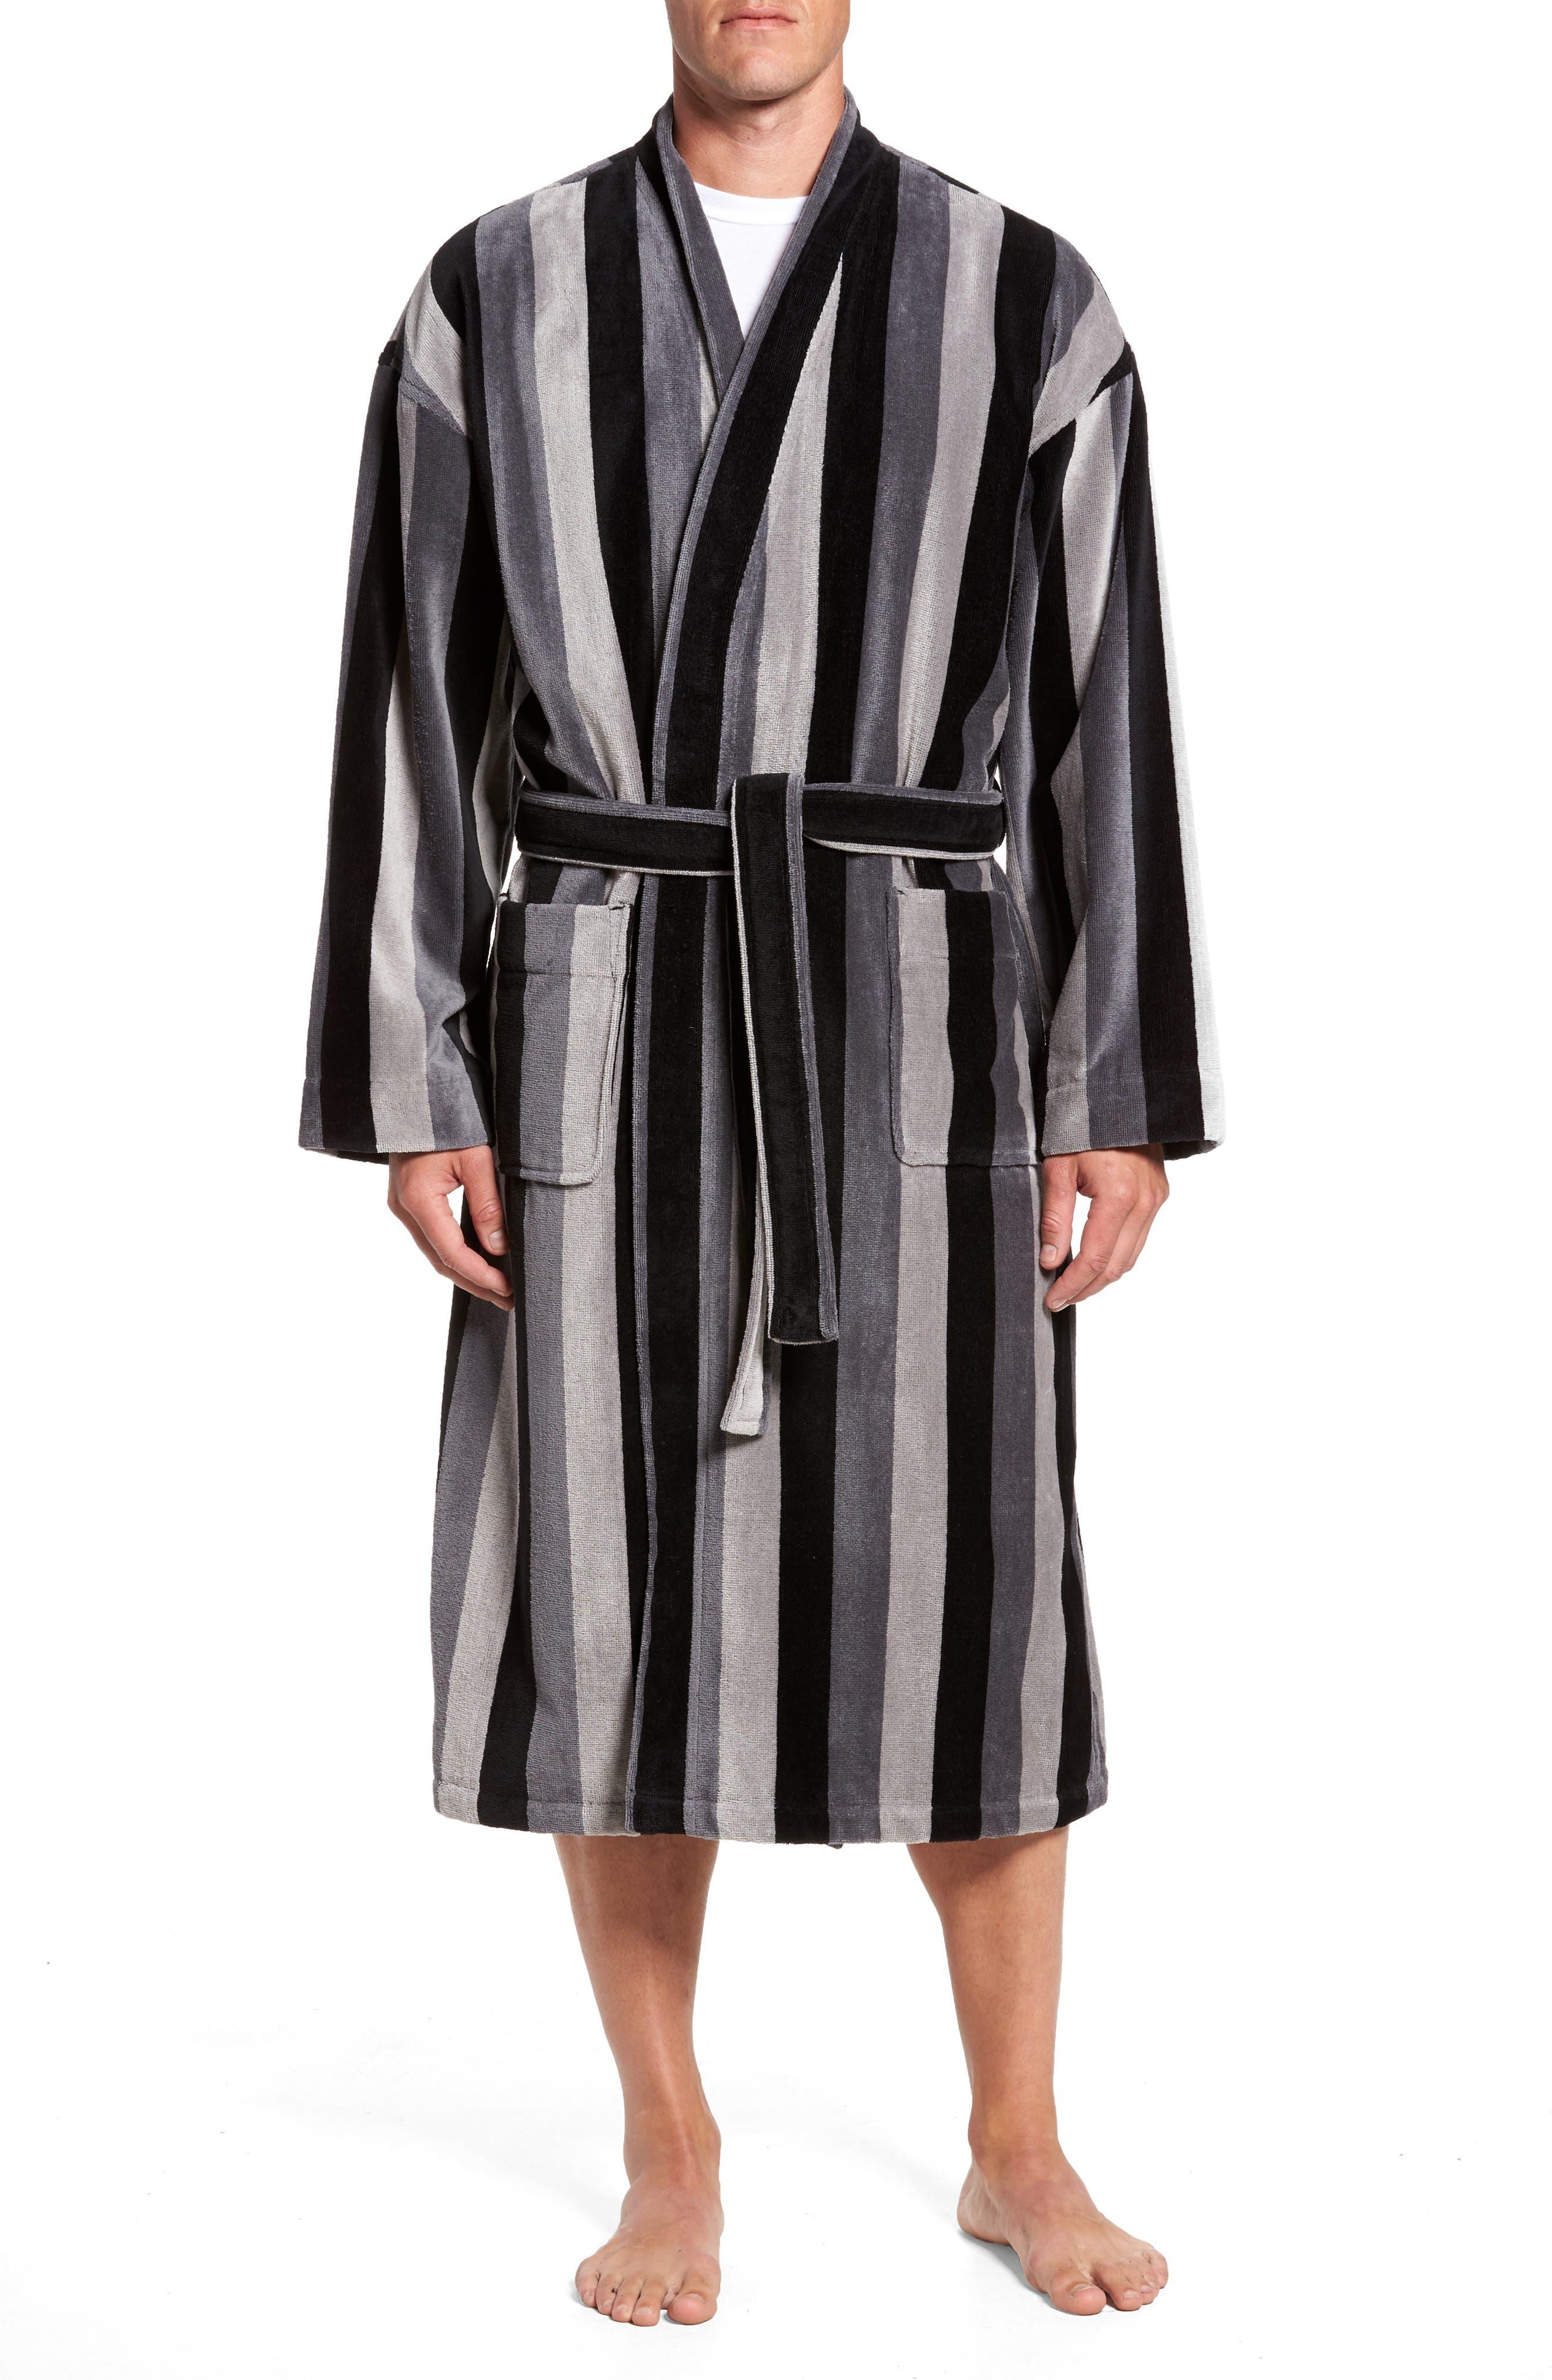 Remarkavelour Robe,                         Main,                         color, Black